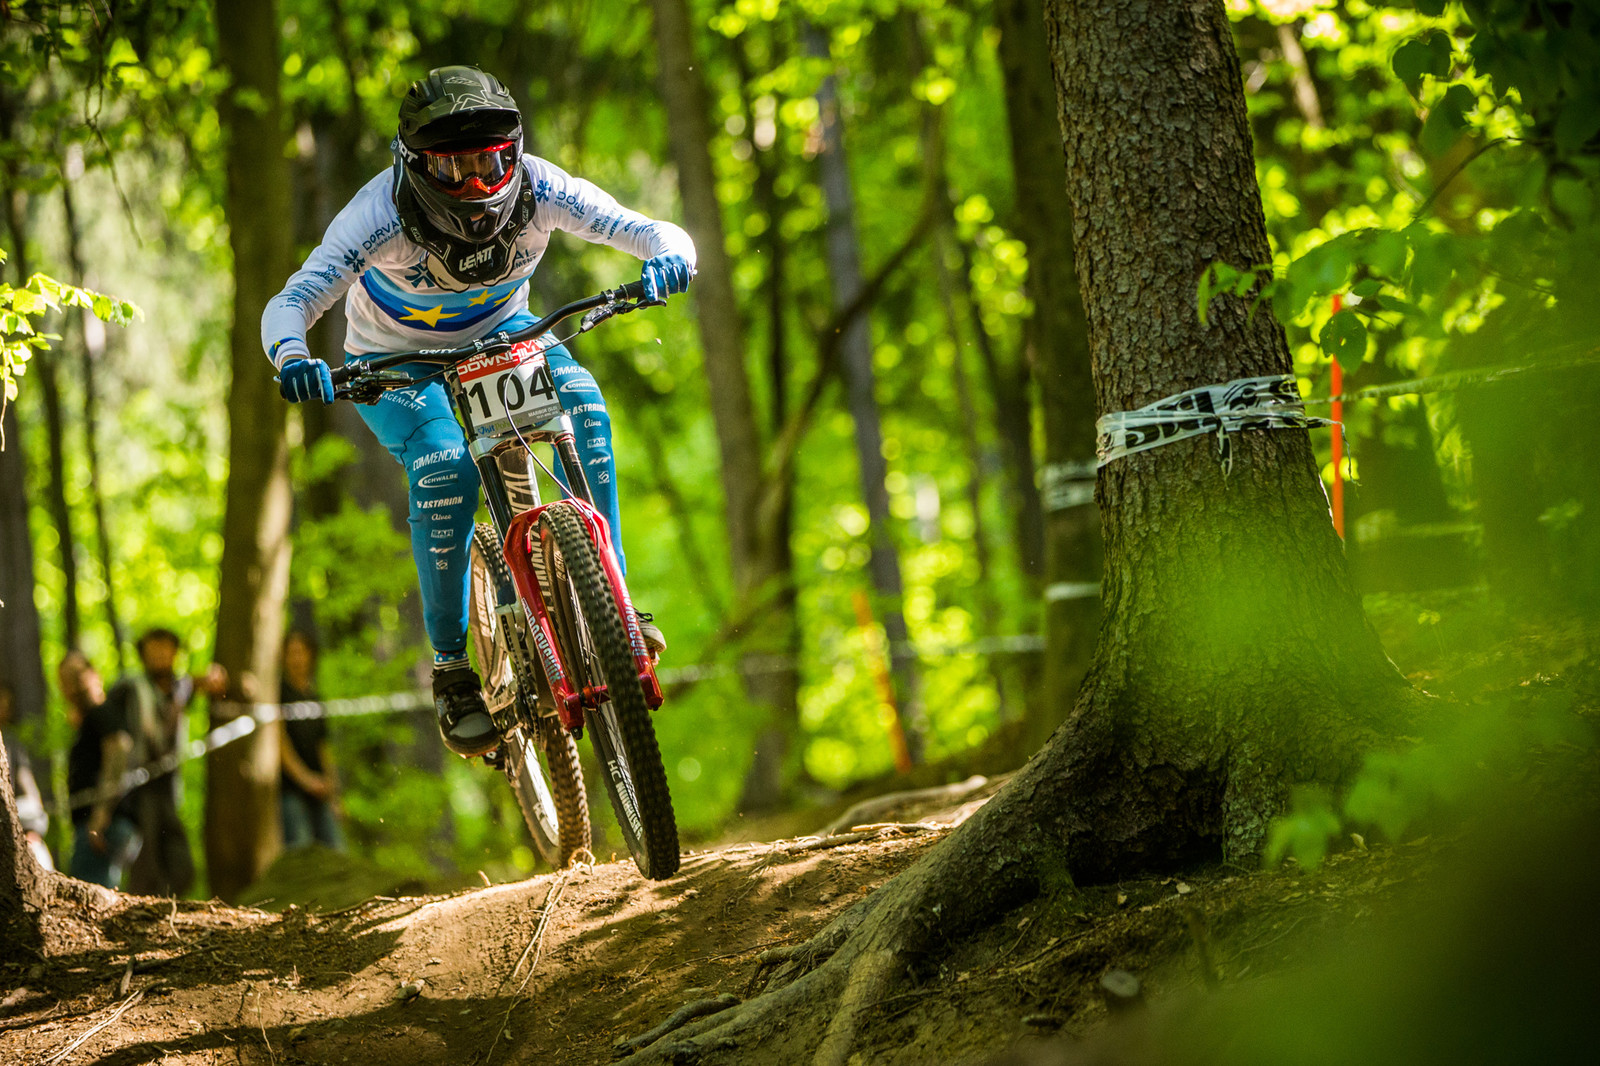 Mona Hrastnik - iXS Downhill Cup Maribor - Race Gallery - Mountain Biking Pictures - Vital MTB